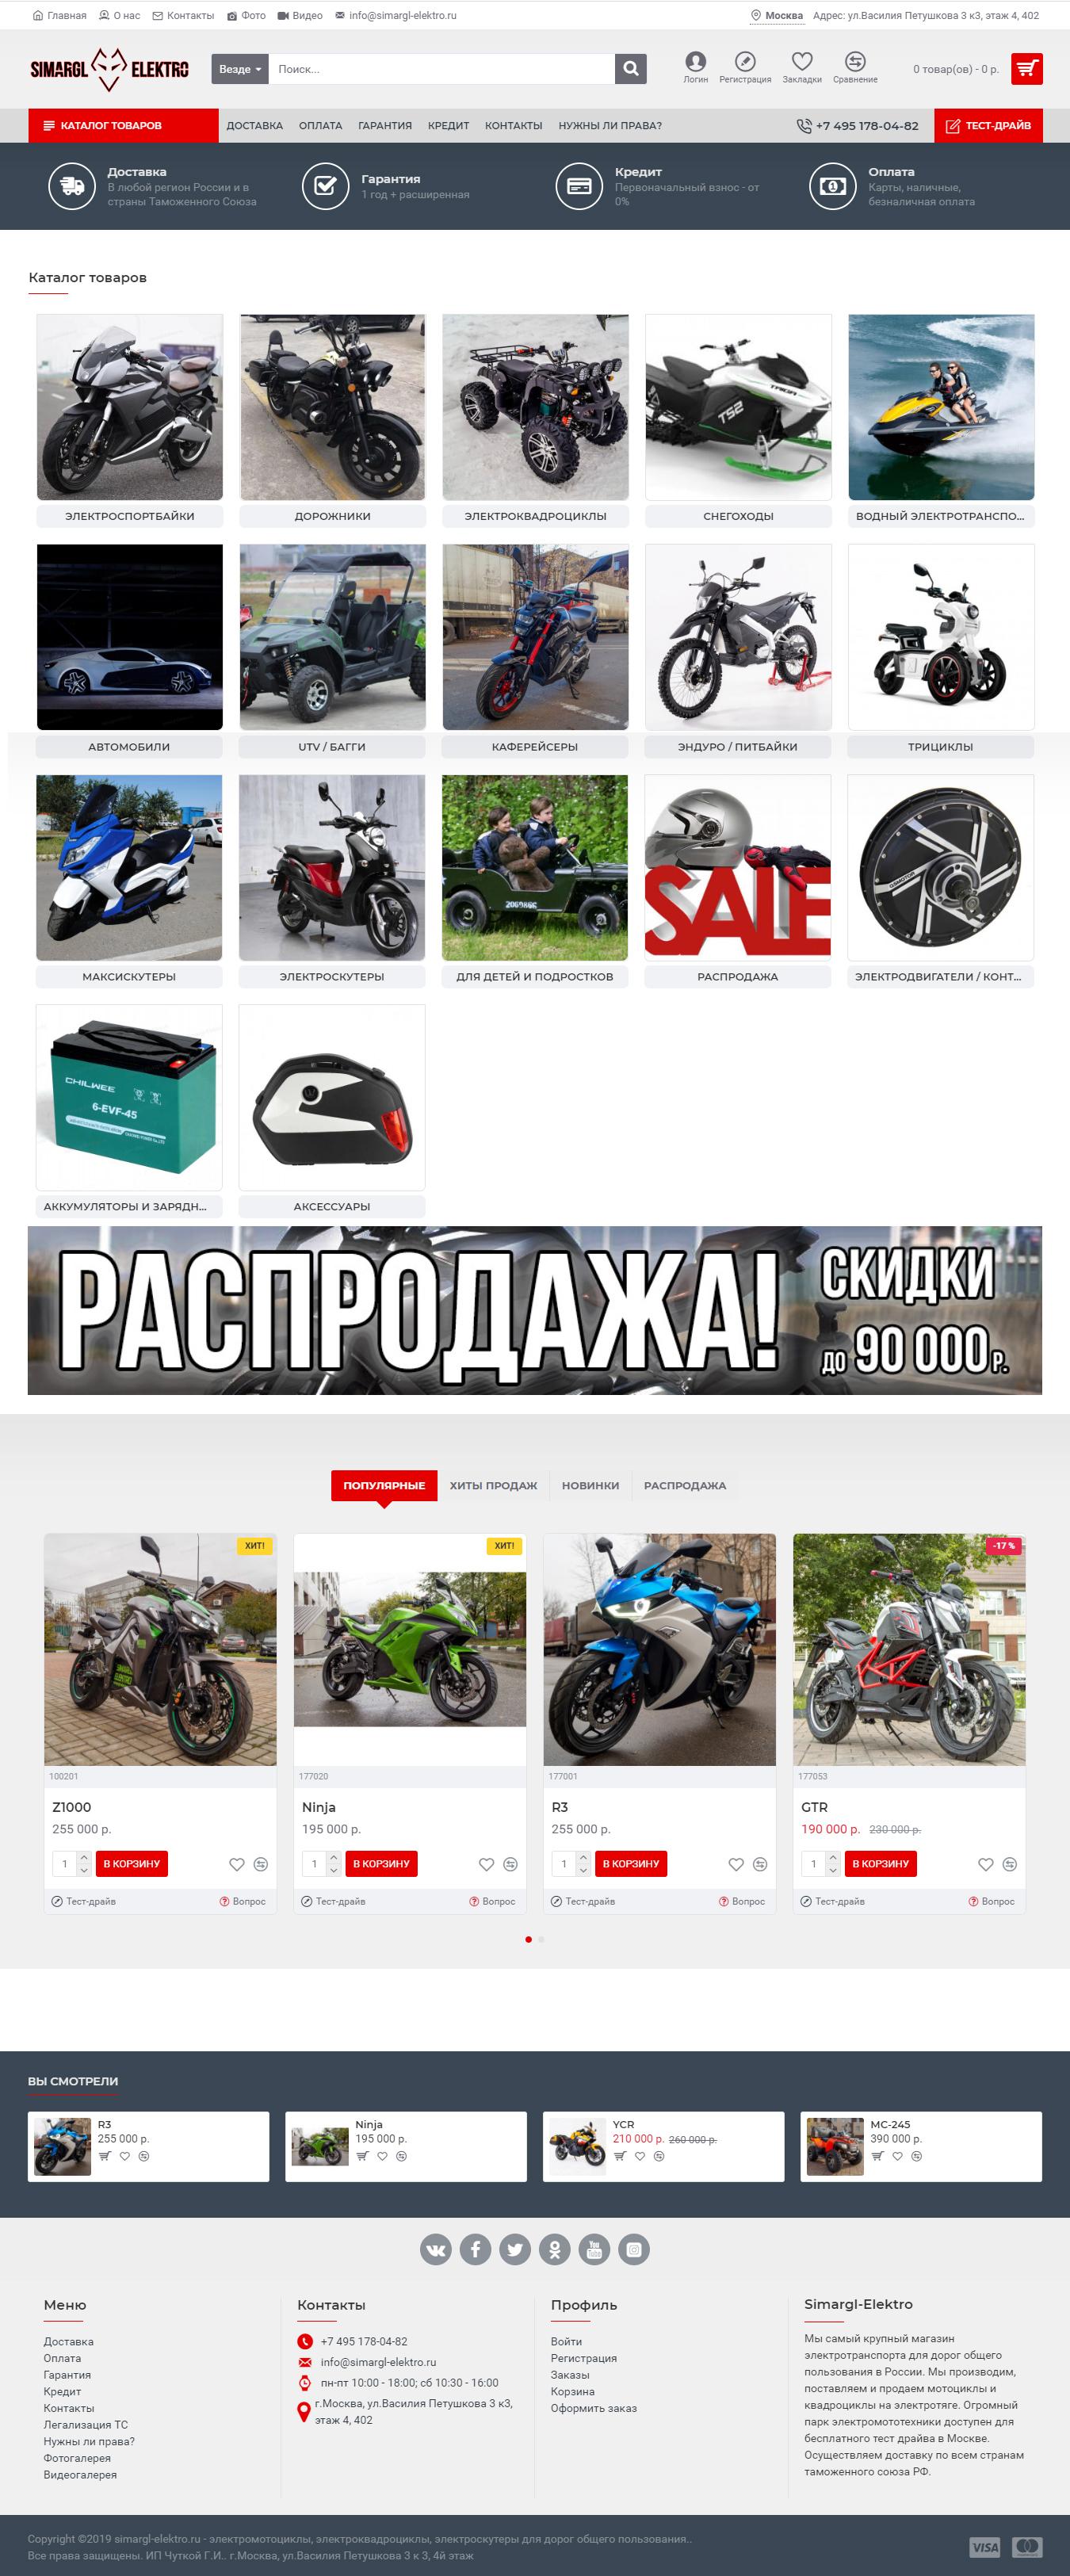 Электротранспорт - интернет-магазин Simargl Electro